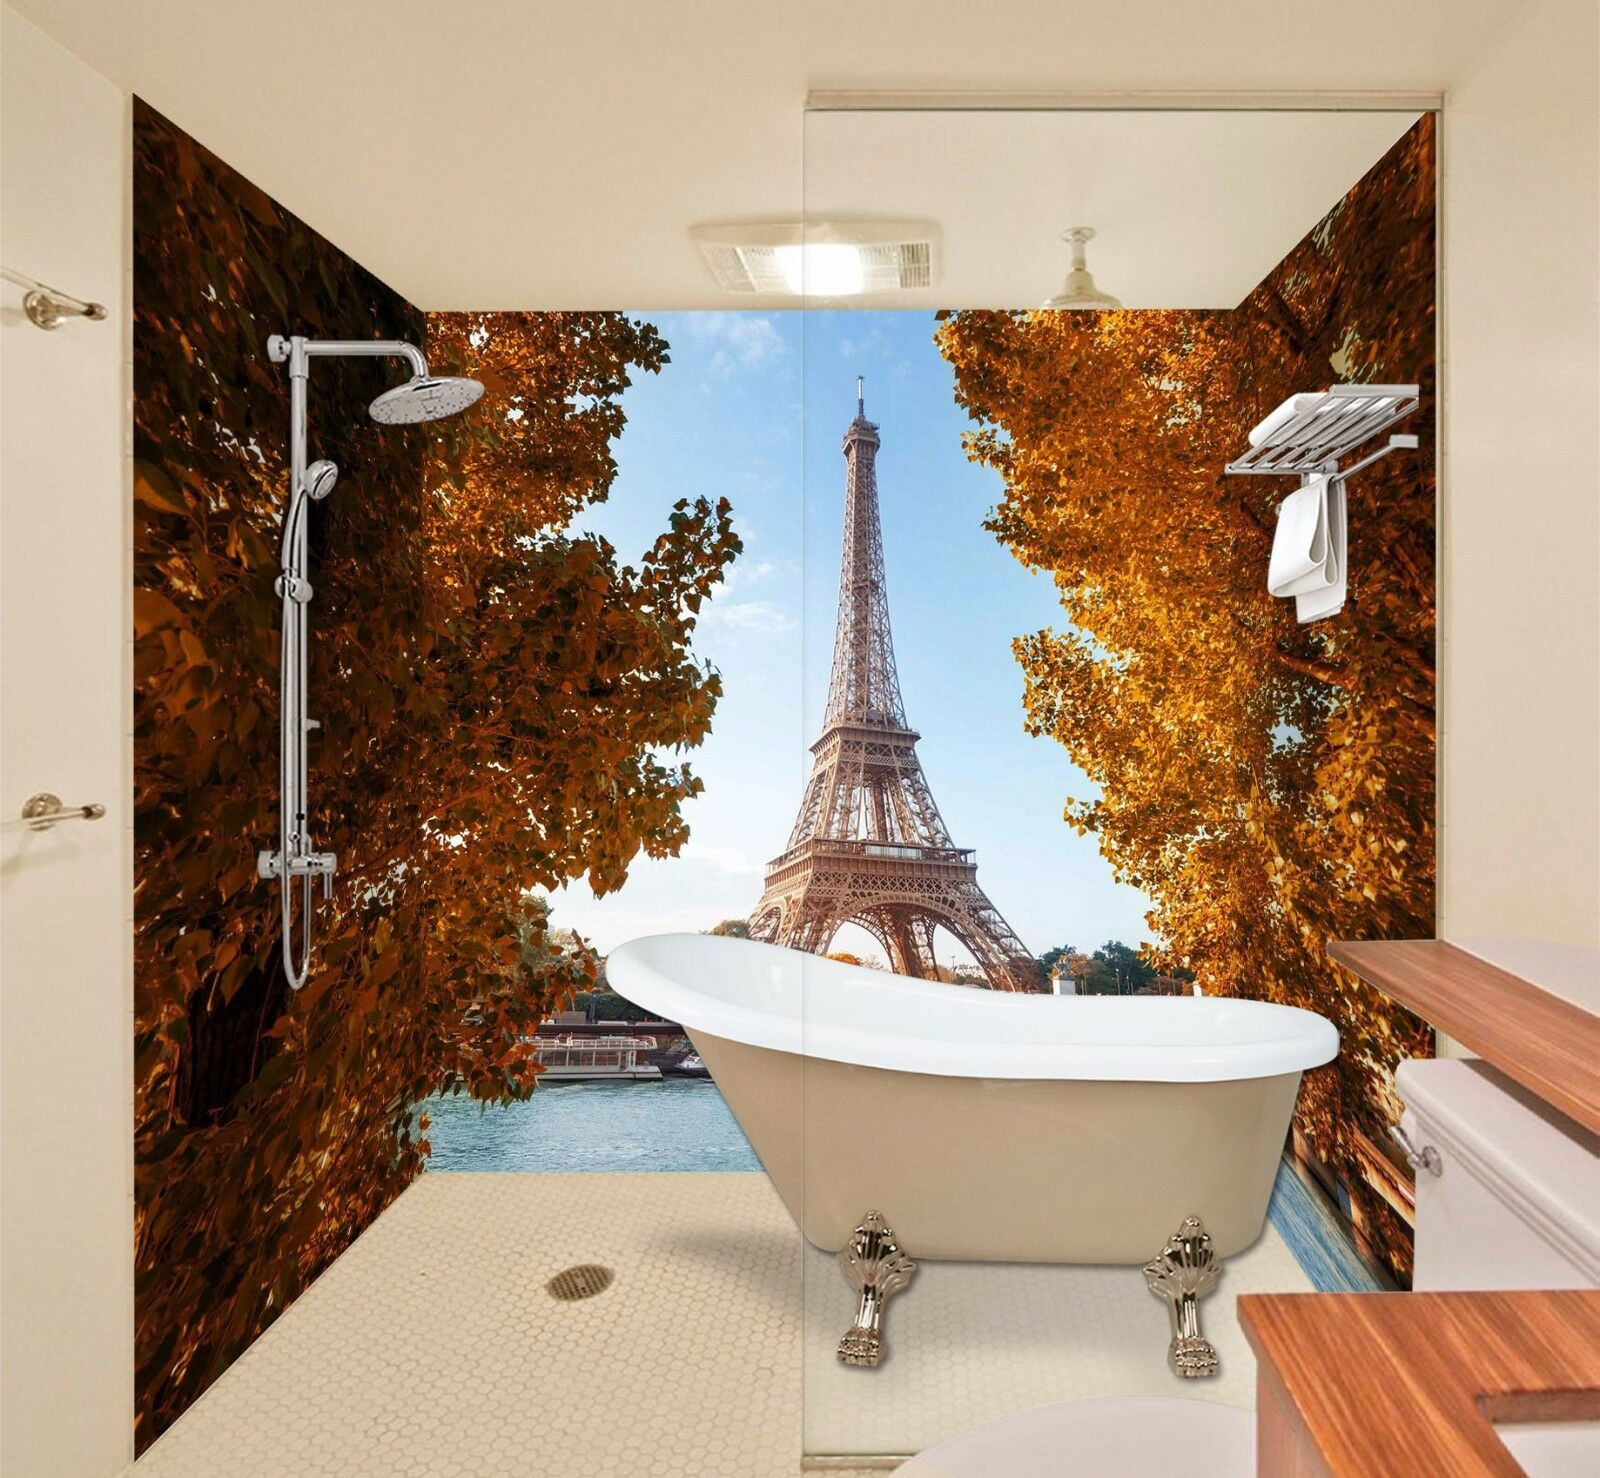 3D Paris Eiffel Tower 4 WallPaper Bathroom Print Decal Wall Deco AJ WALLPAPER AU